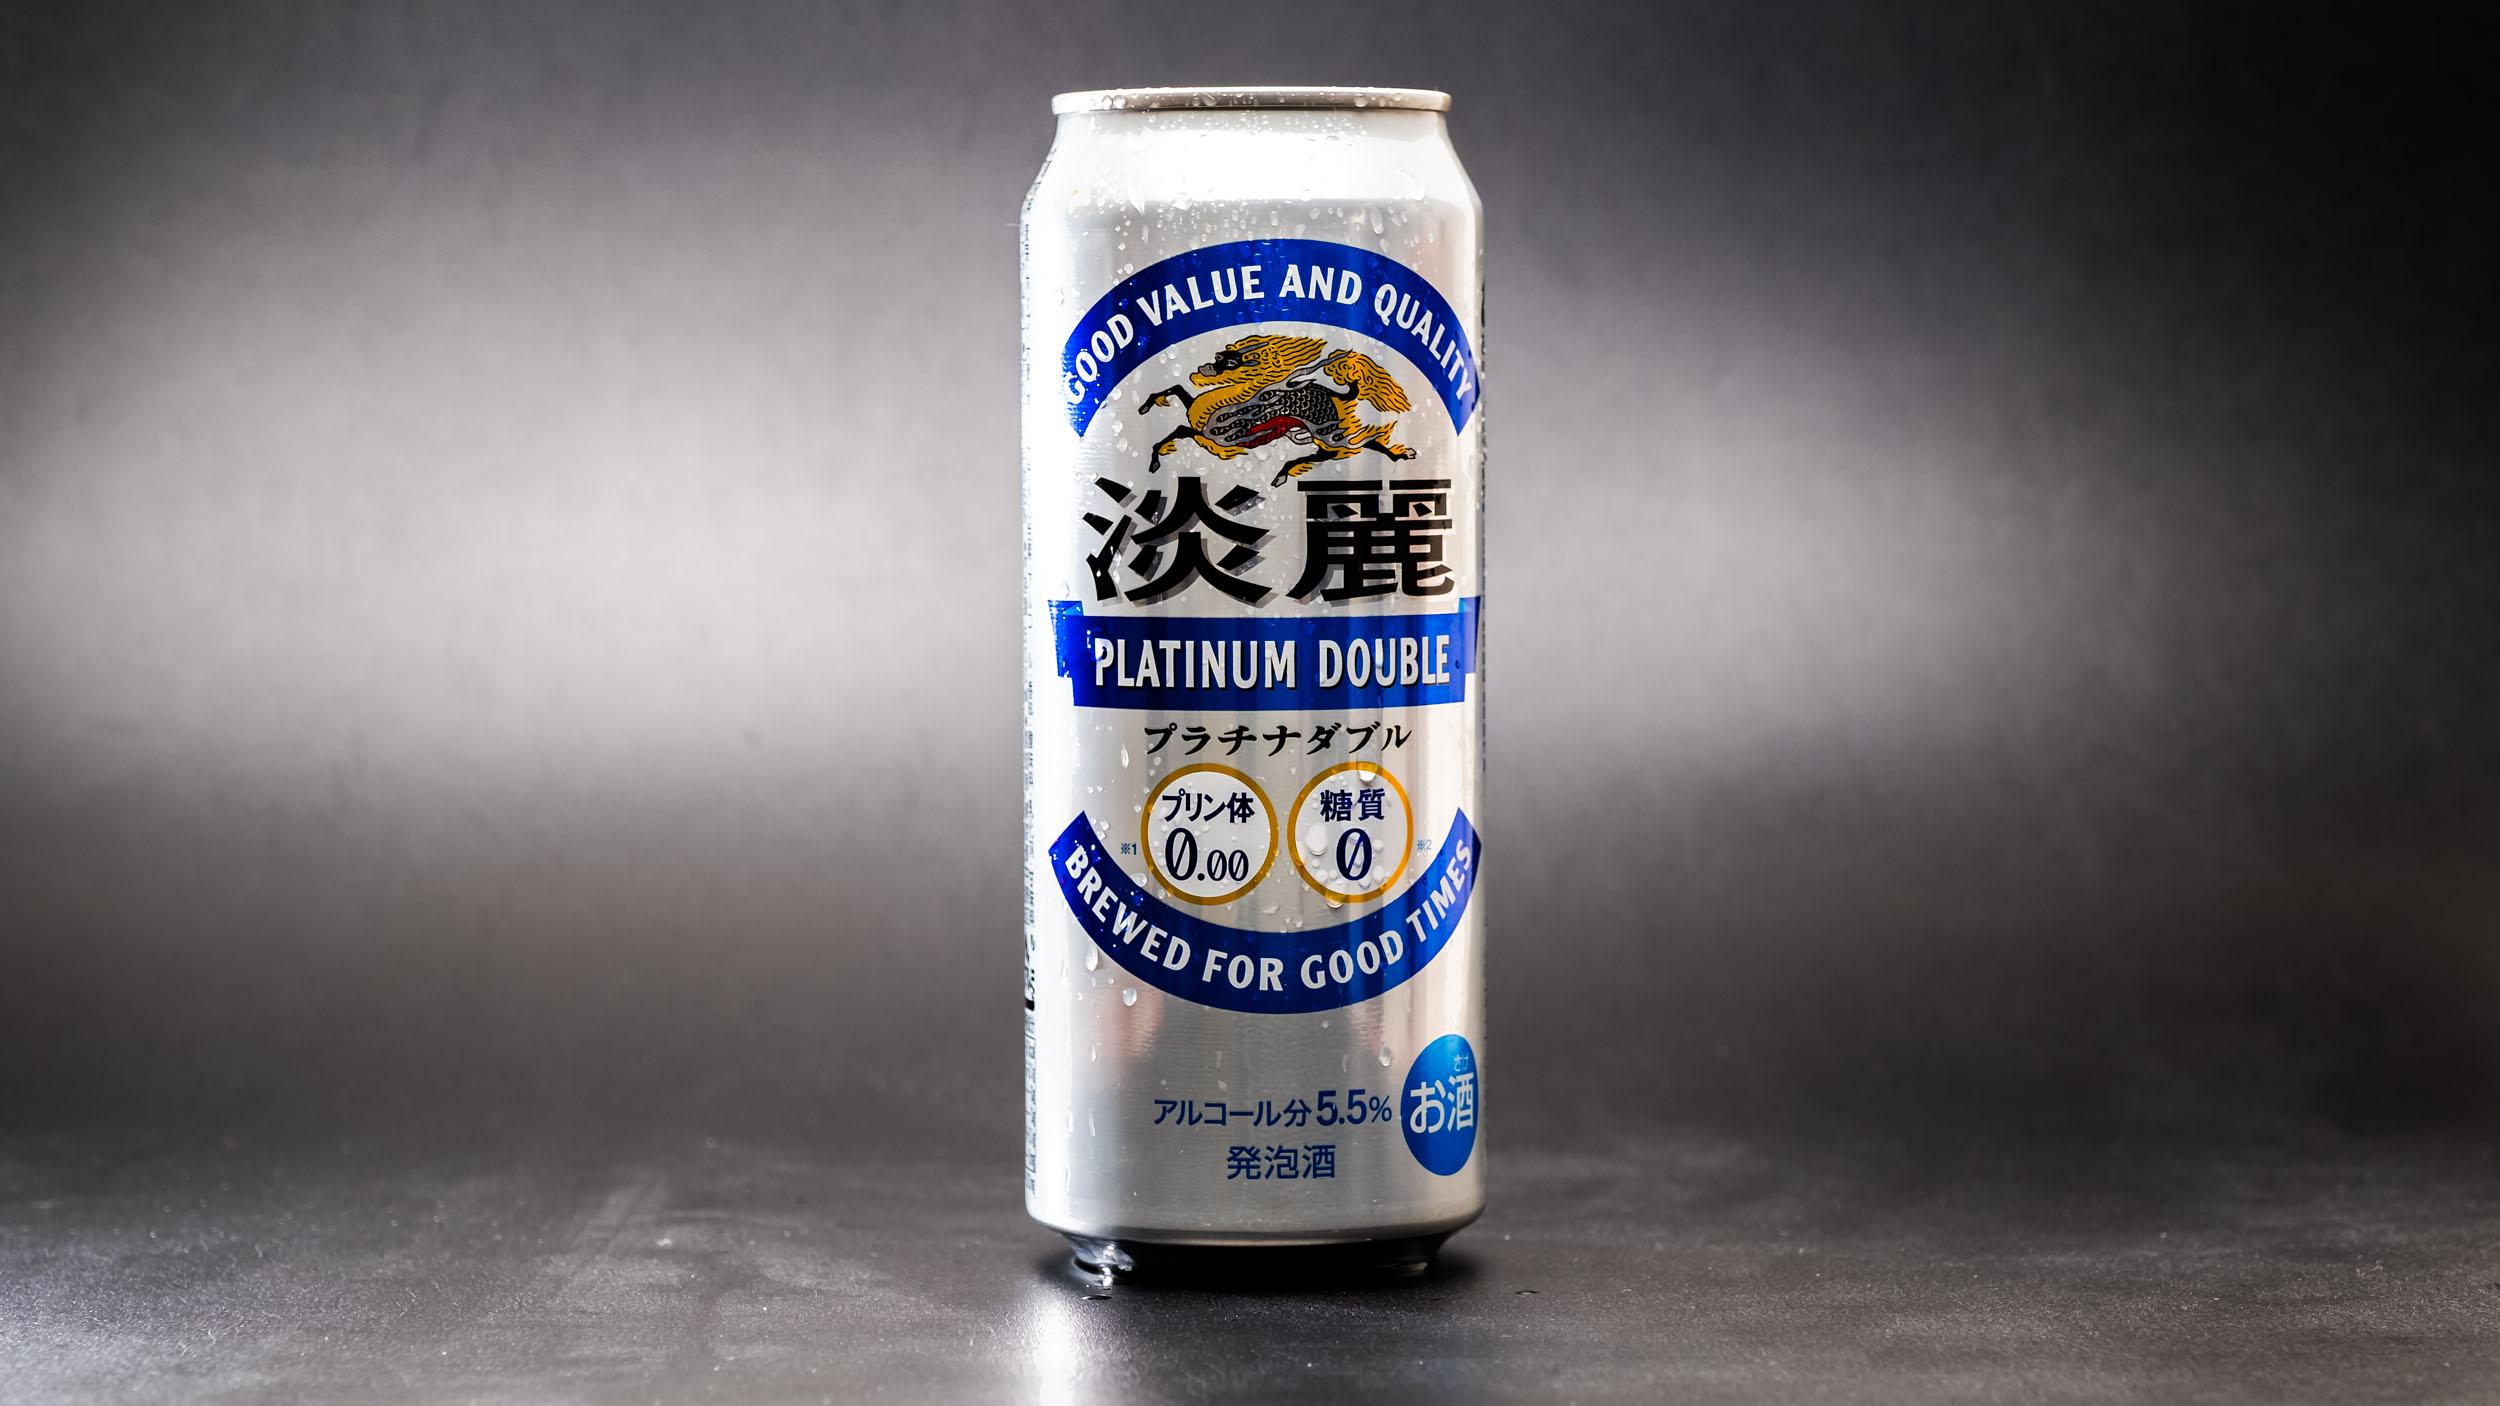 Kirin's Platinum Double